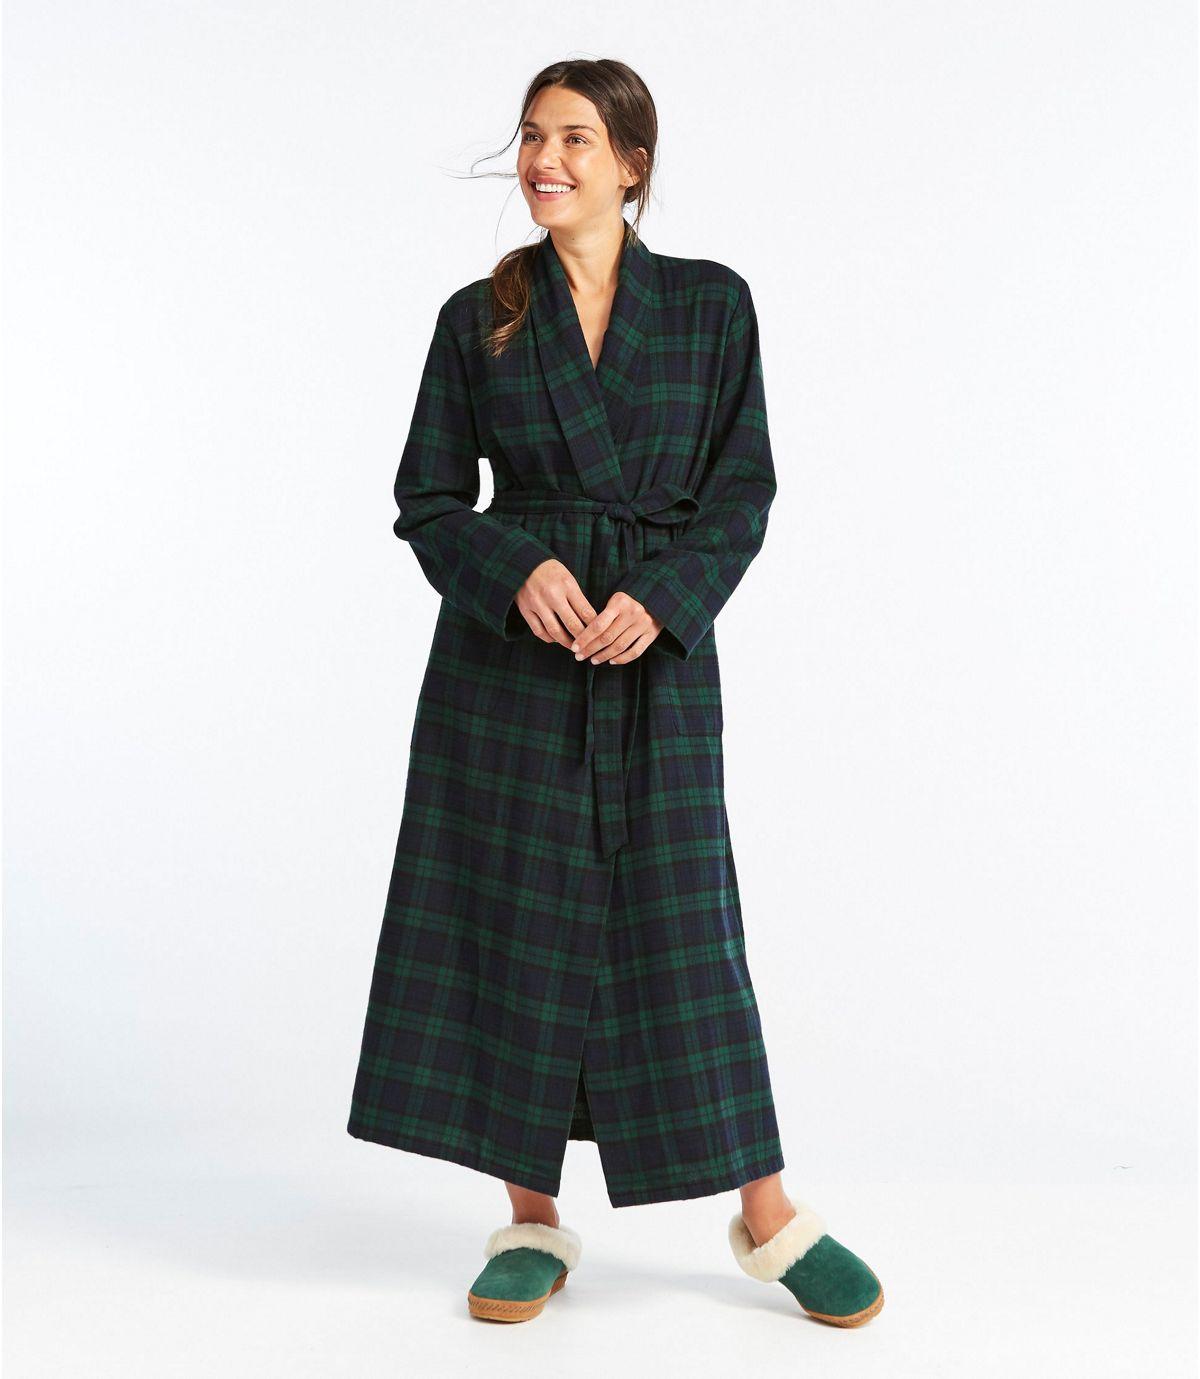 Best Bathrobes For Women Cute Comfy Robes She Ll Love